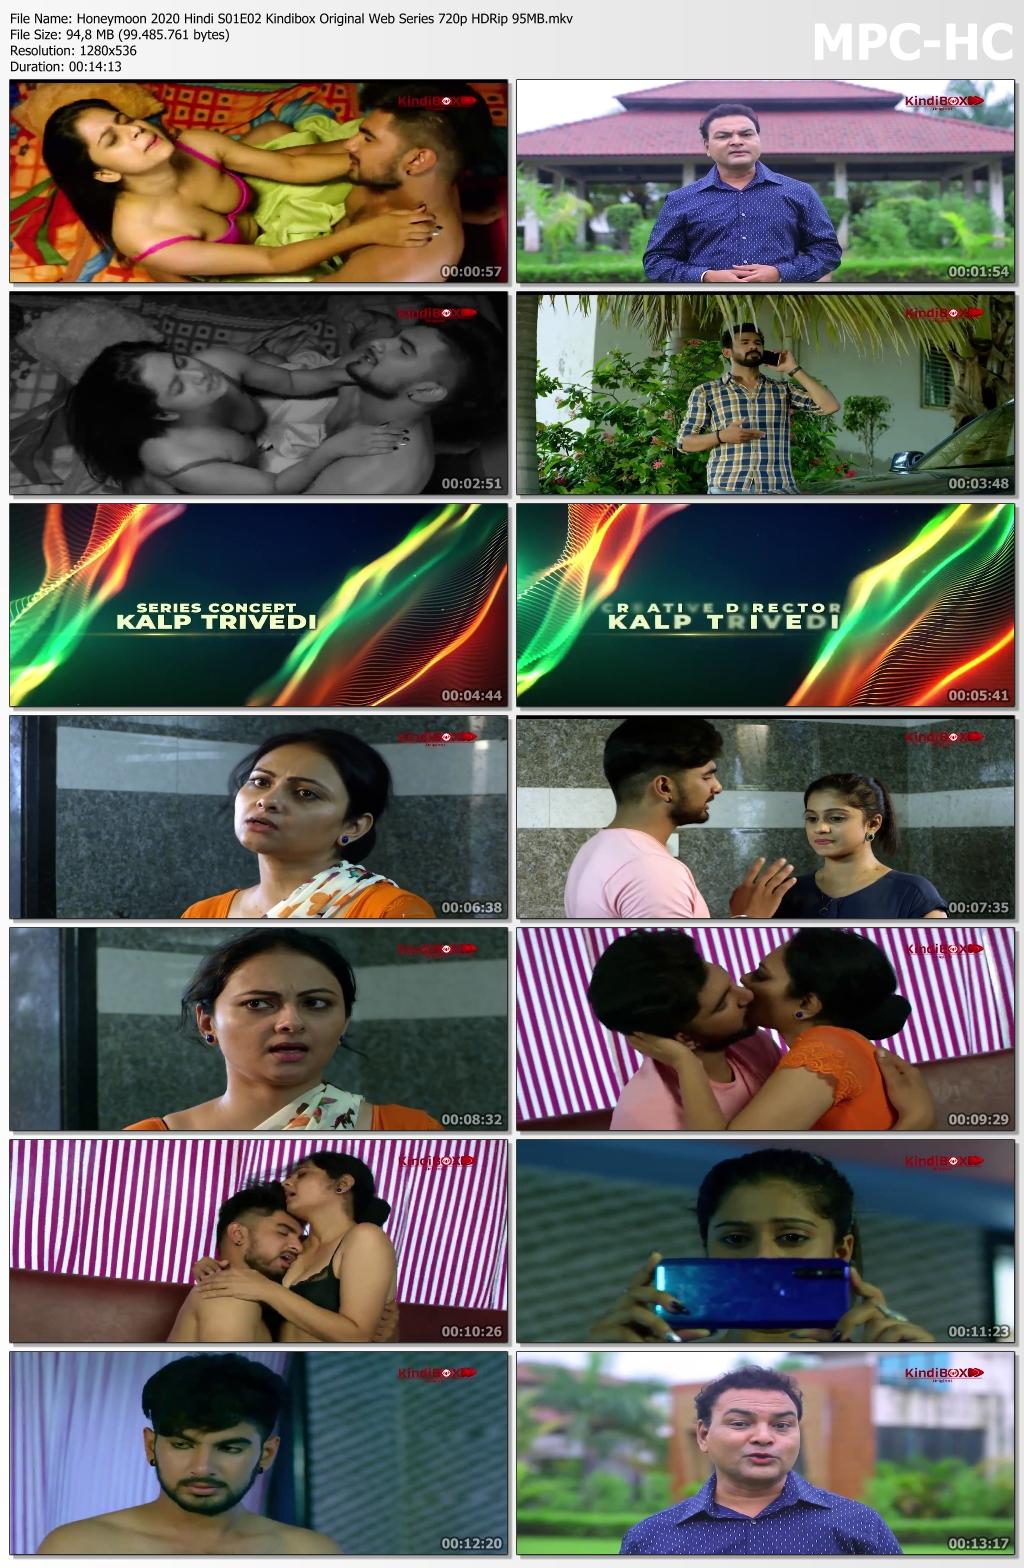 Honeymoon-2020-Hindi-S01-E02-Kindibox-Original-Web-Series-720p-HDRip-95-MB-mkv-thumbs